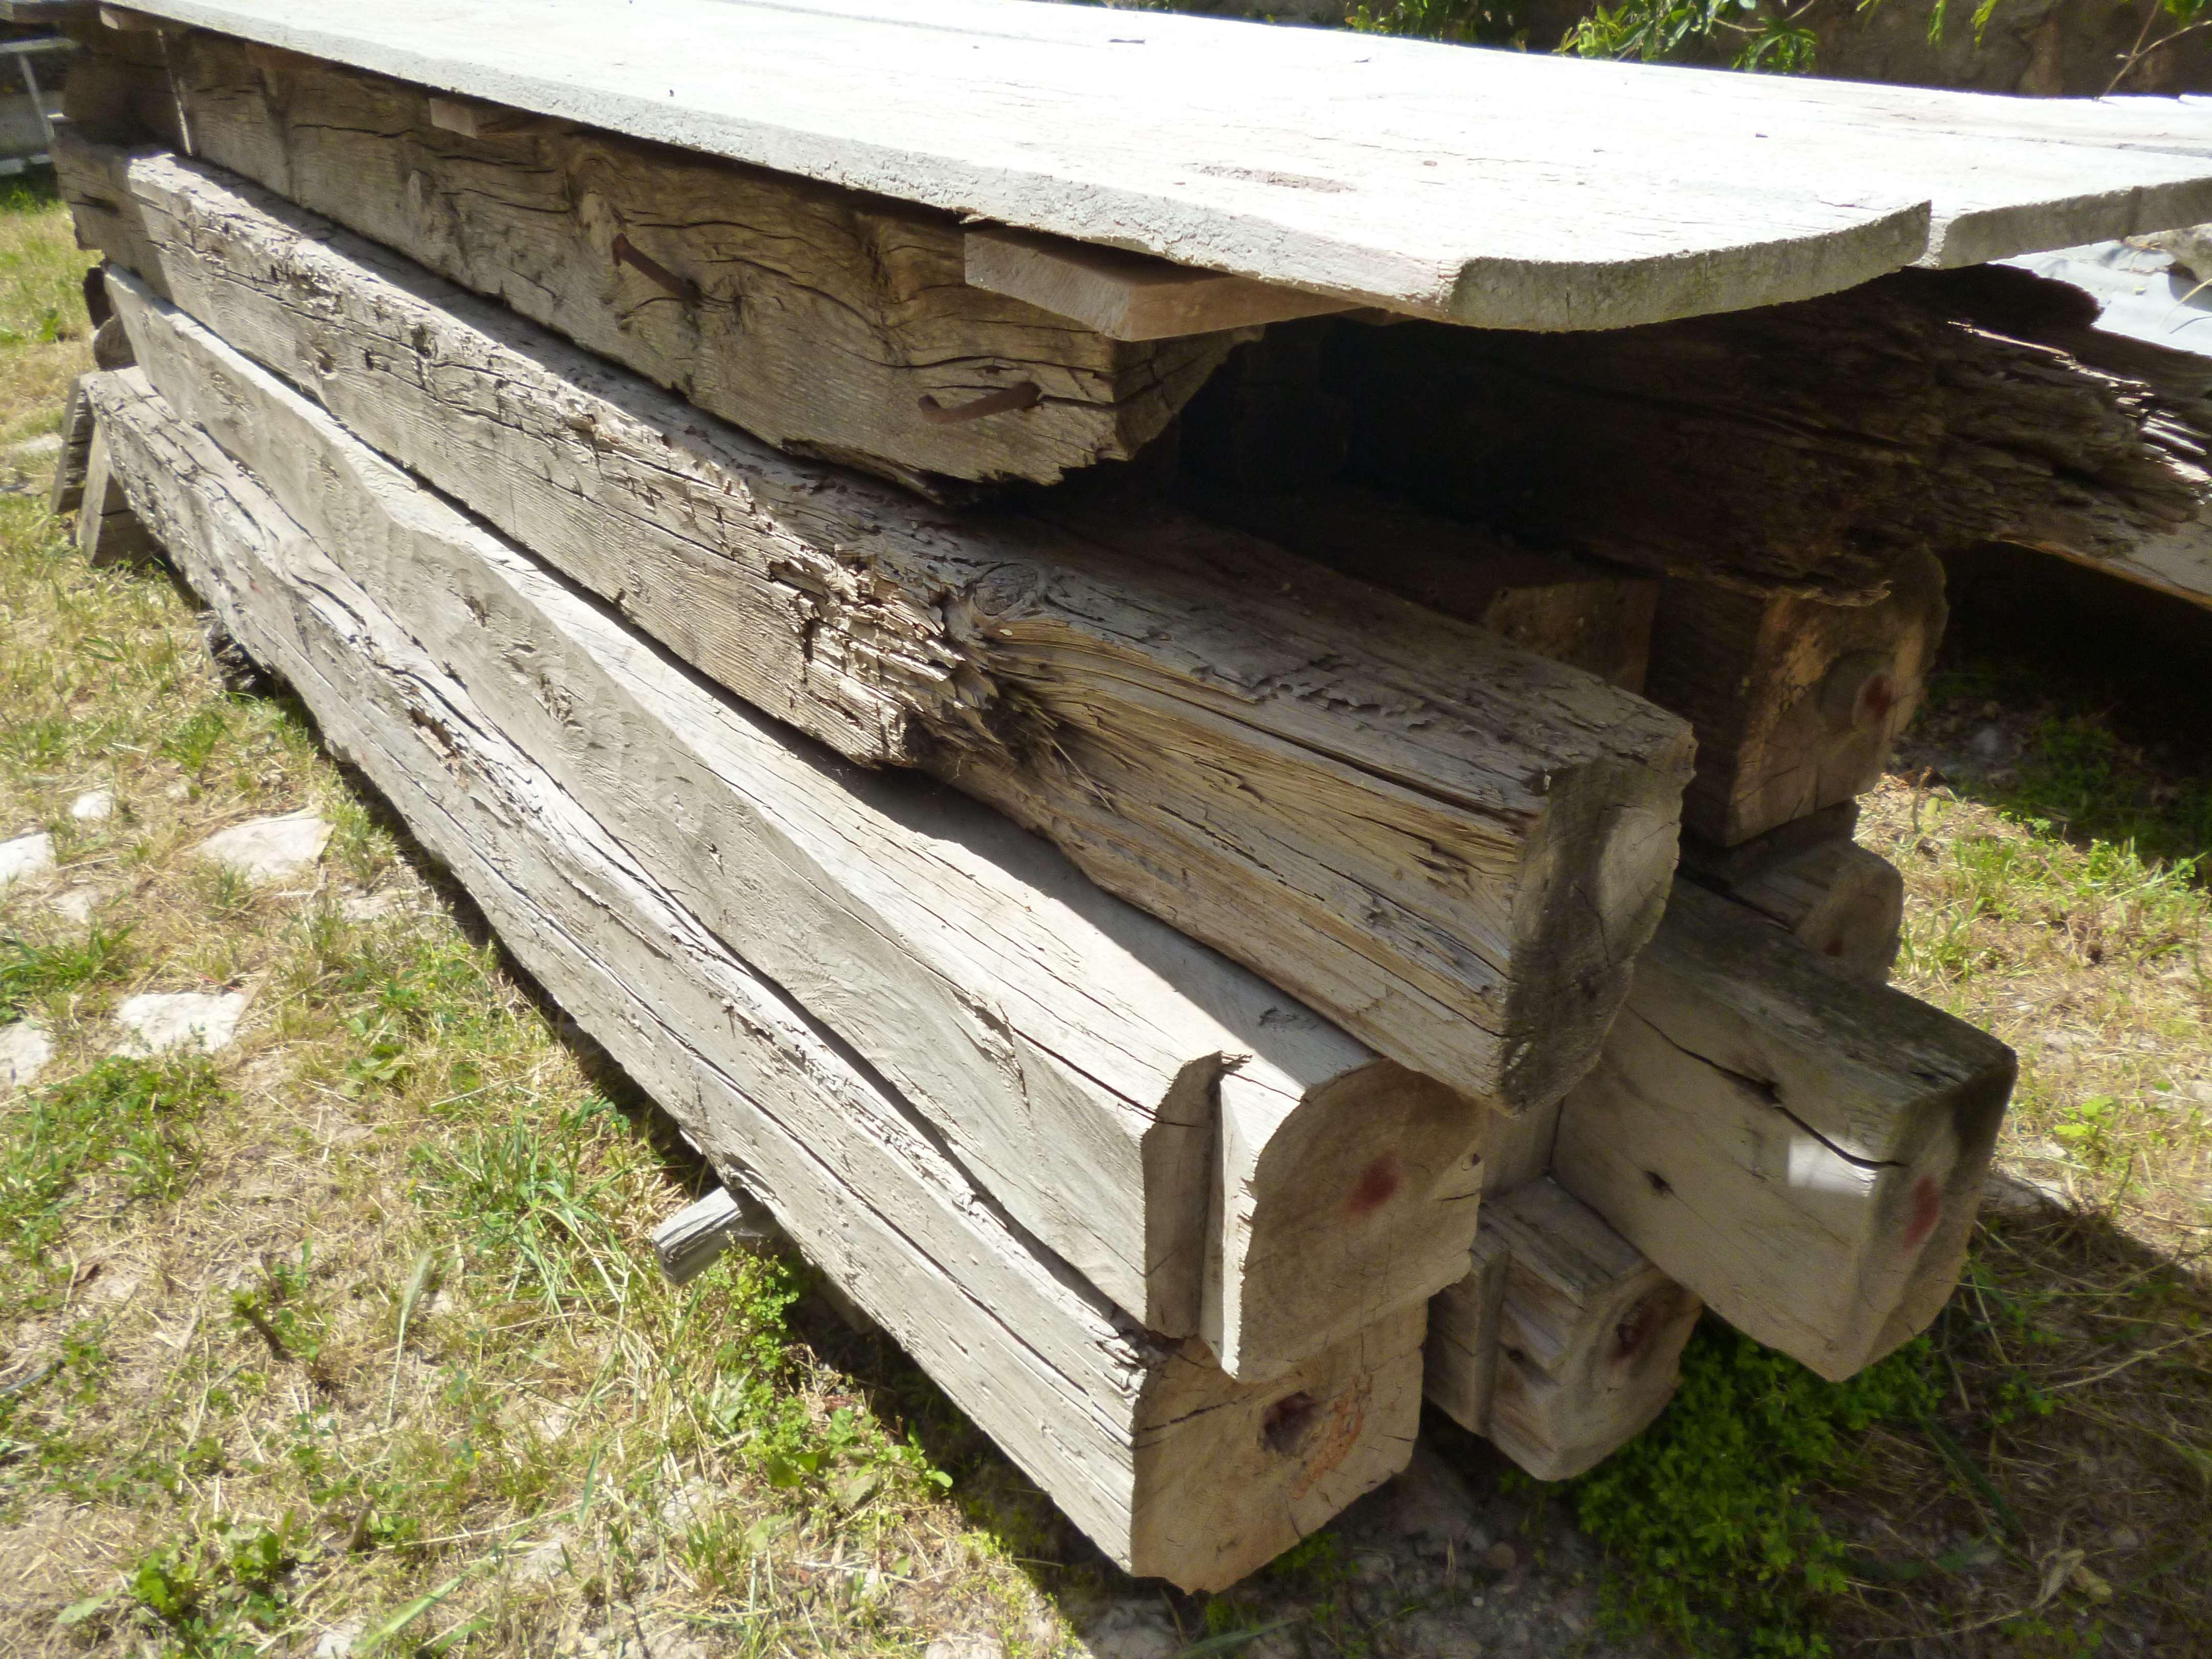 Cambiar vigas de madera beautiful decoracion vigas de madera trendy mueble salon salon cambiar - Cambiar vigas de madera ...